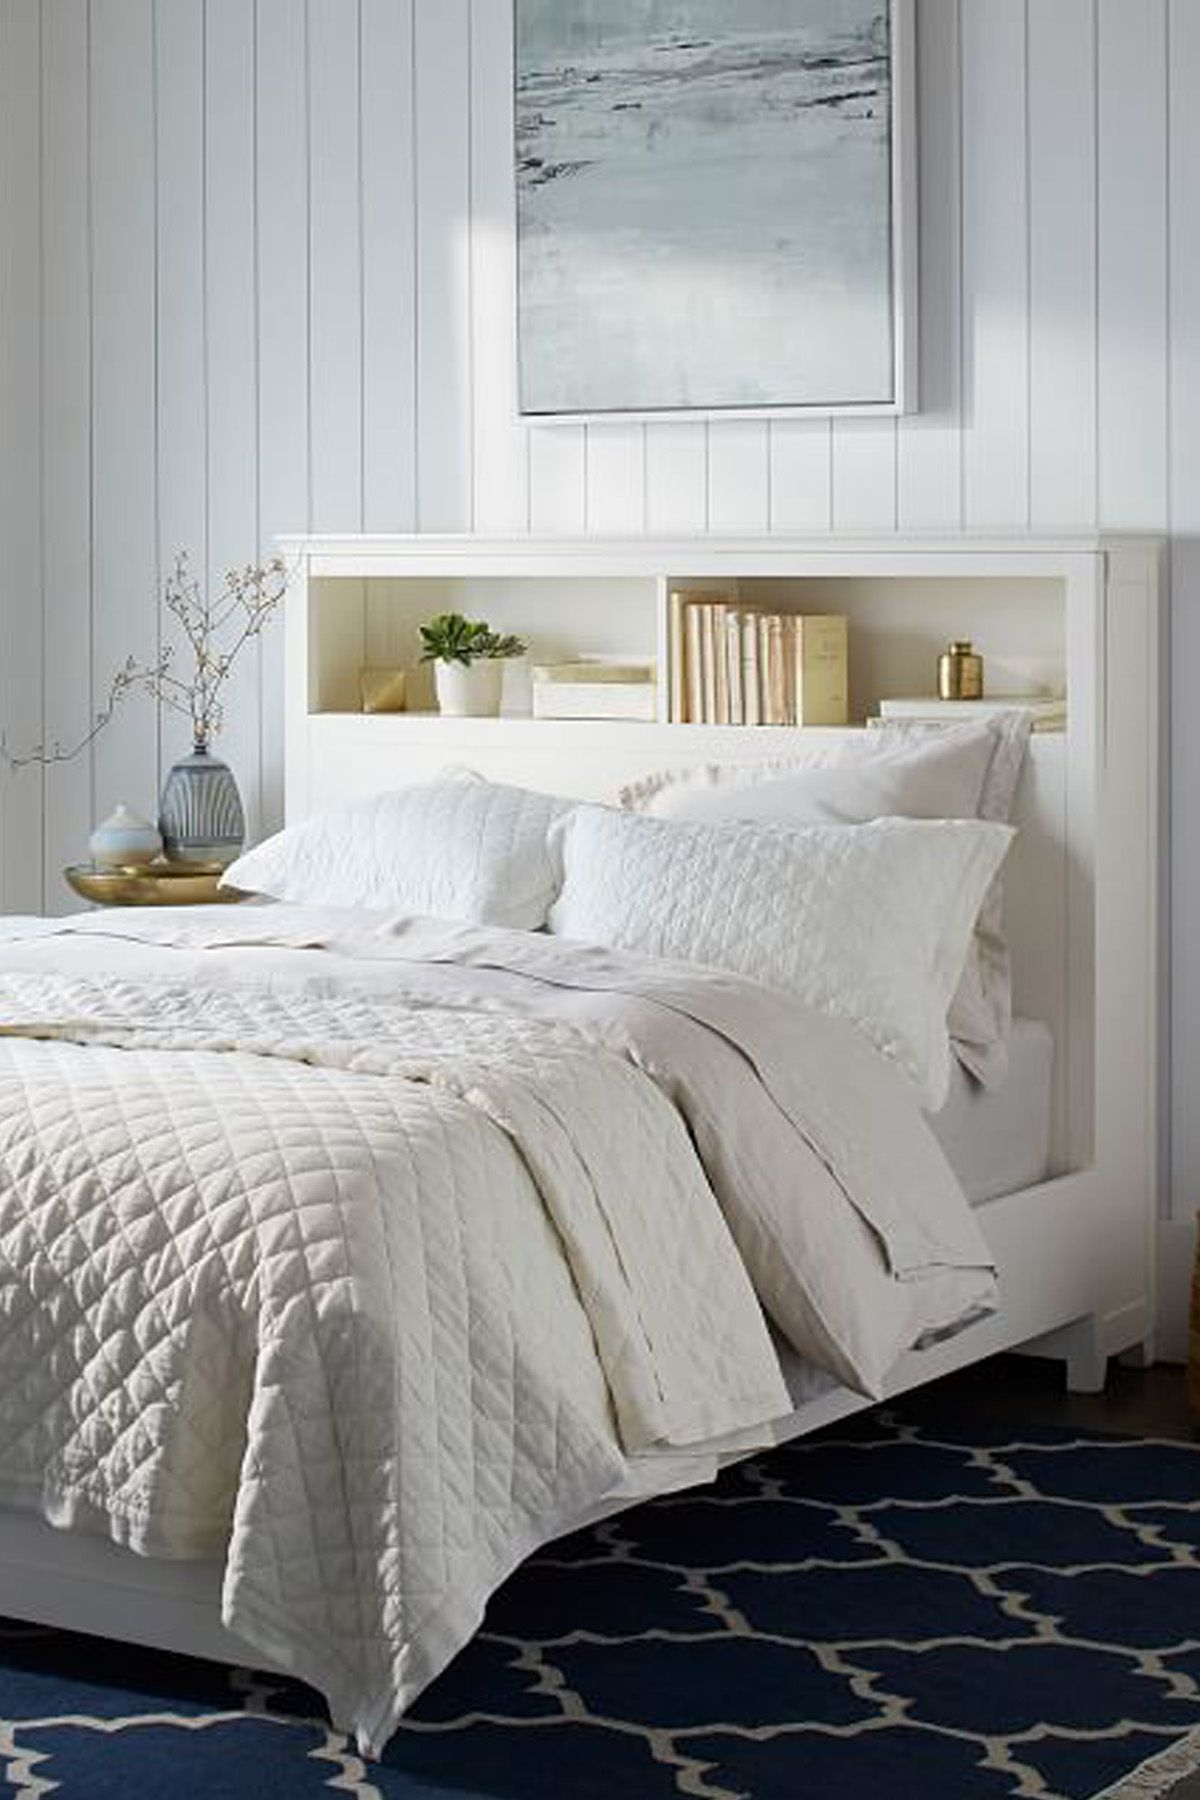 20 Best Headboard Ideas - Unique Designs for Bed Headboards